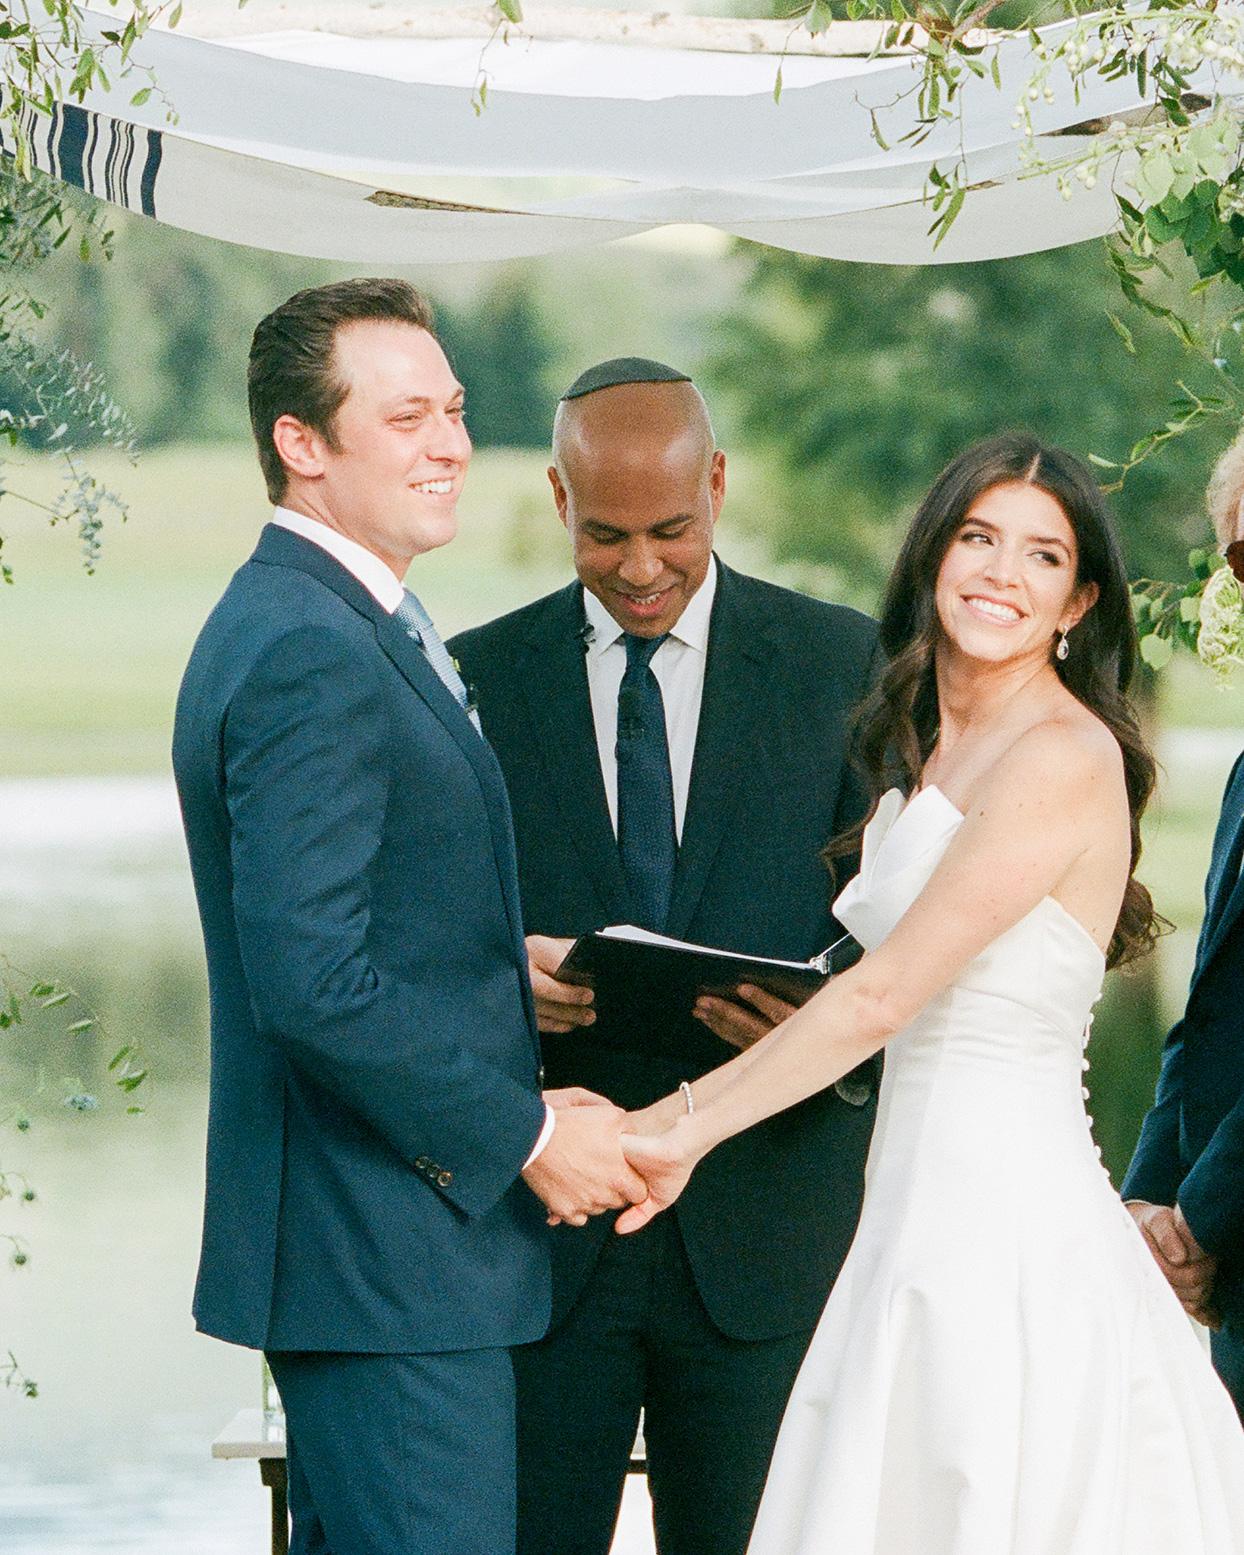 jessica aaron wedding couple during ceremony